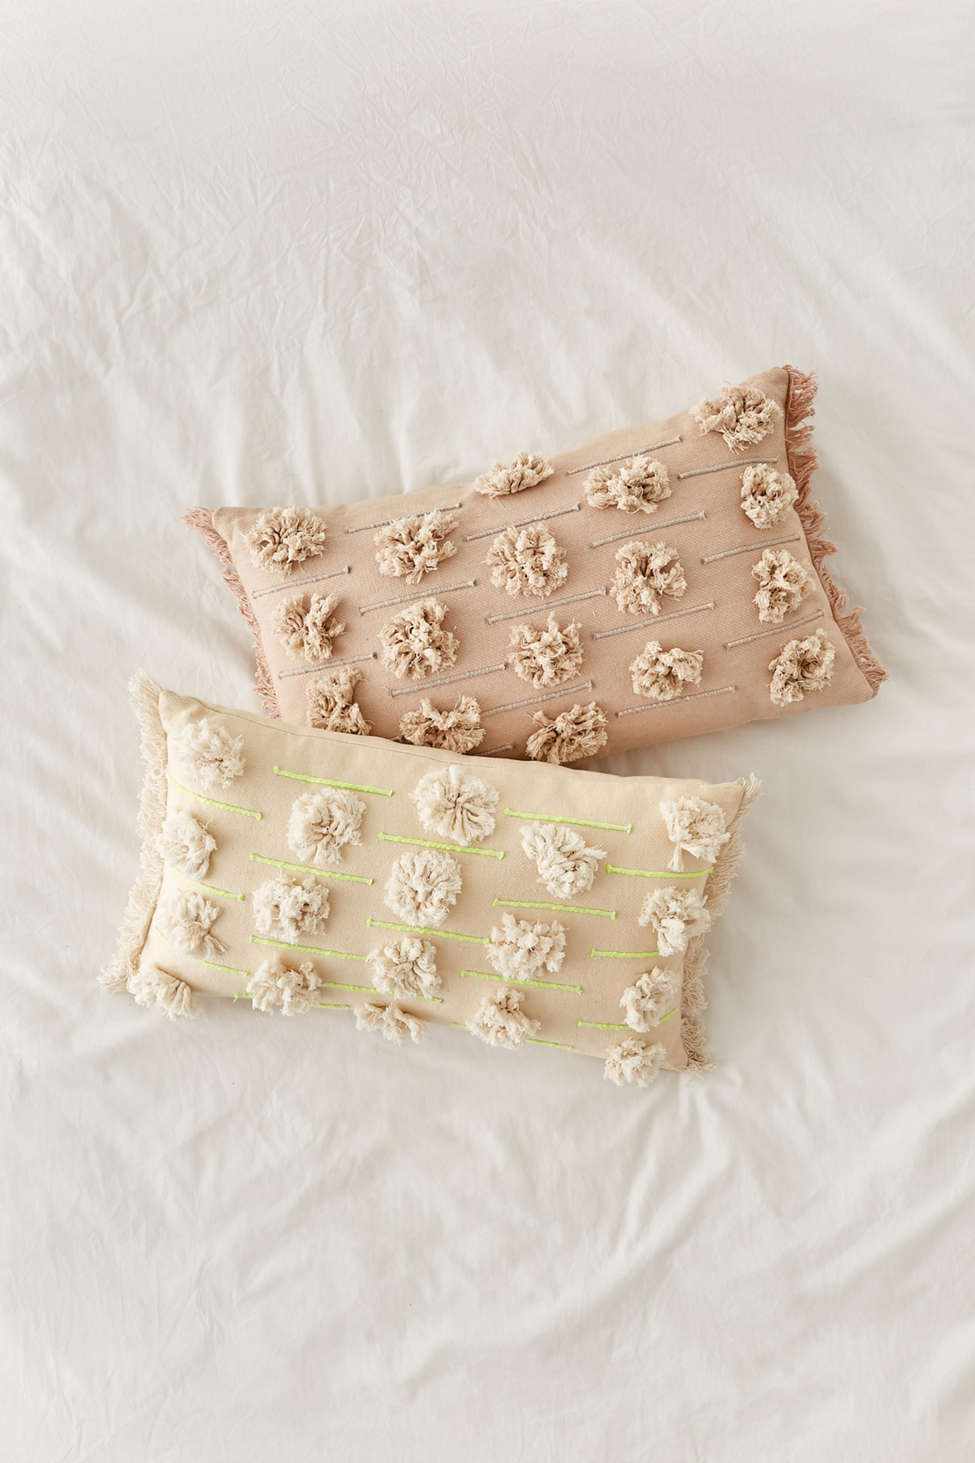 Slide View: 5: Edra Tufted Lumbar Pillow